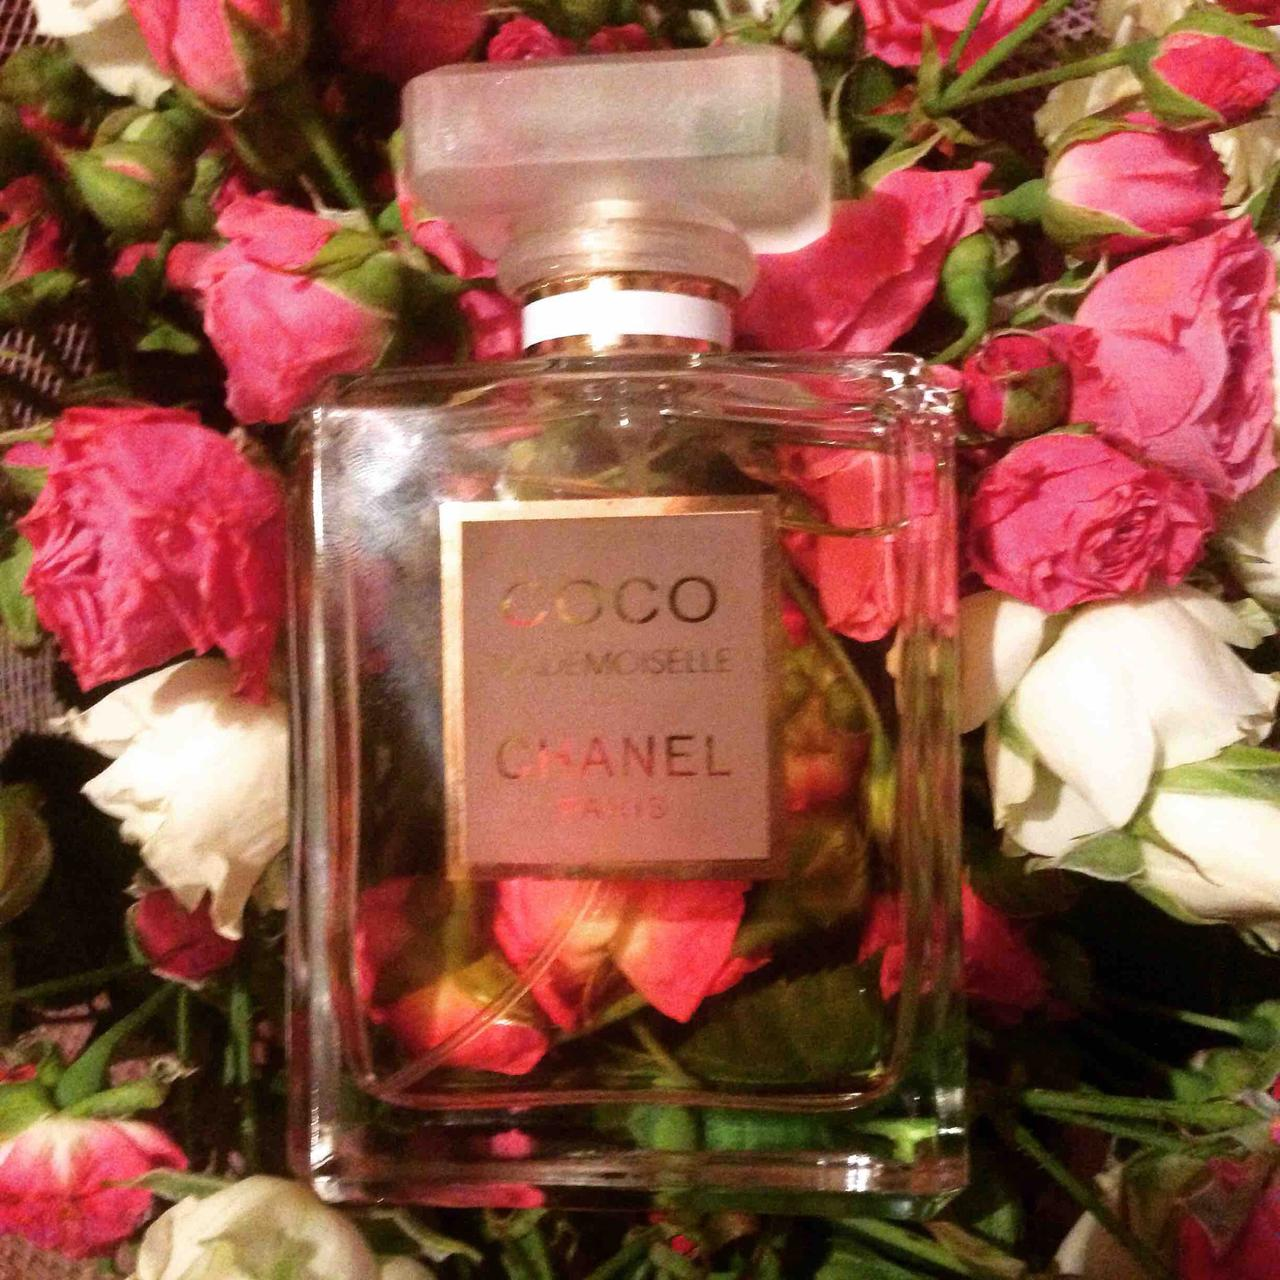 Chanel Coco Mademoiselle изысканный аромат